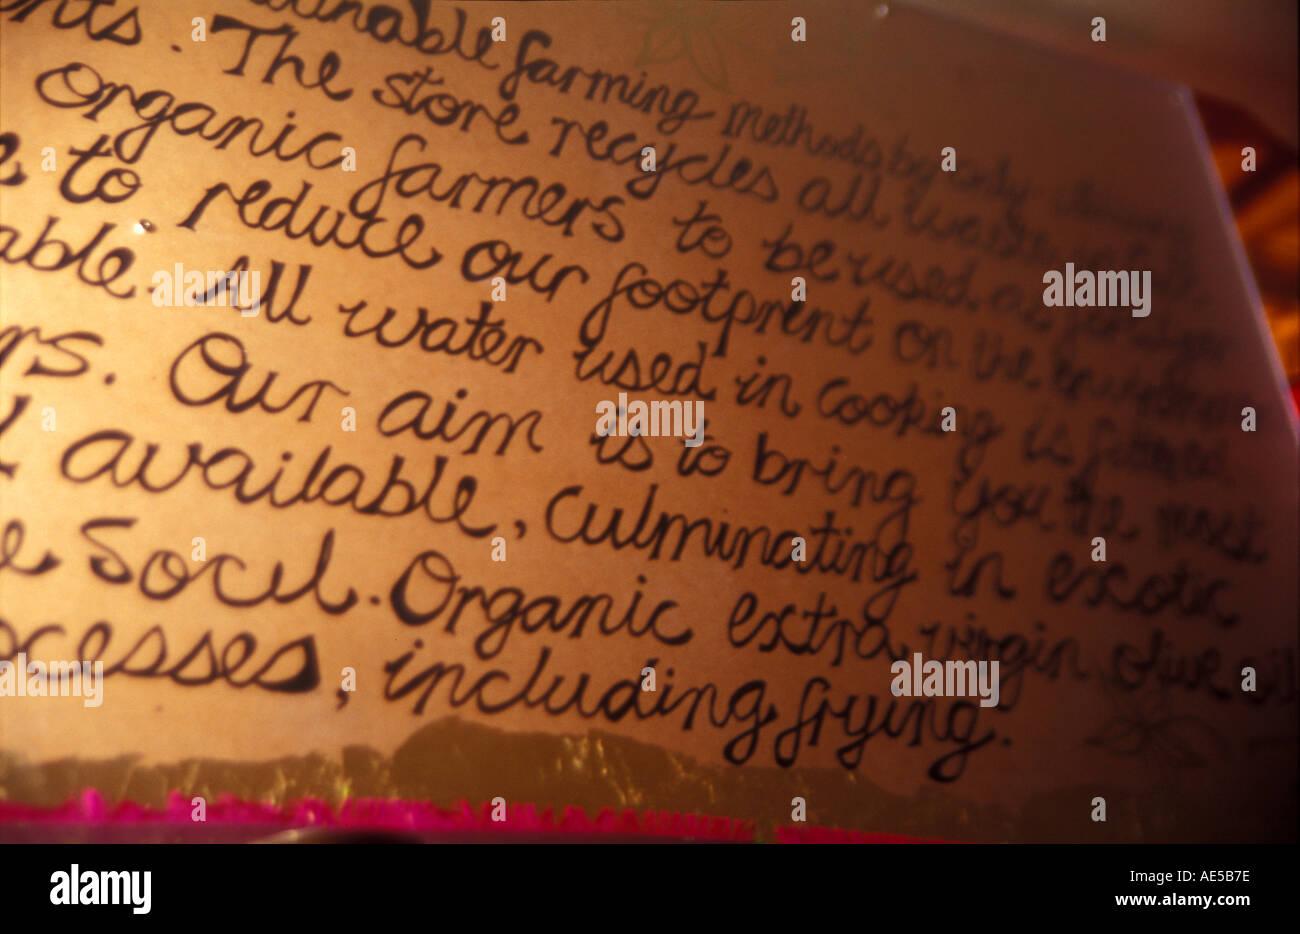 text menu manifesto mission statment wall poster the organic